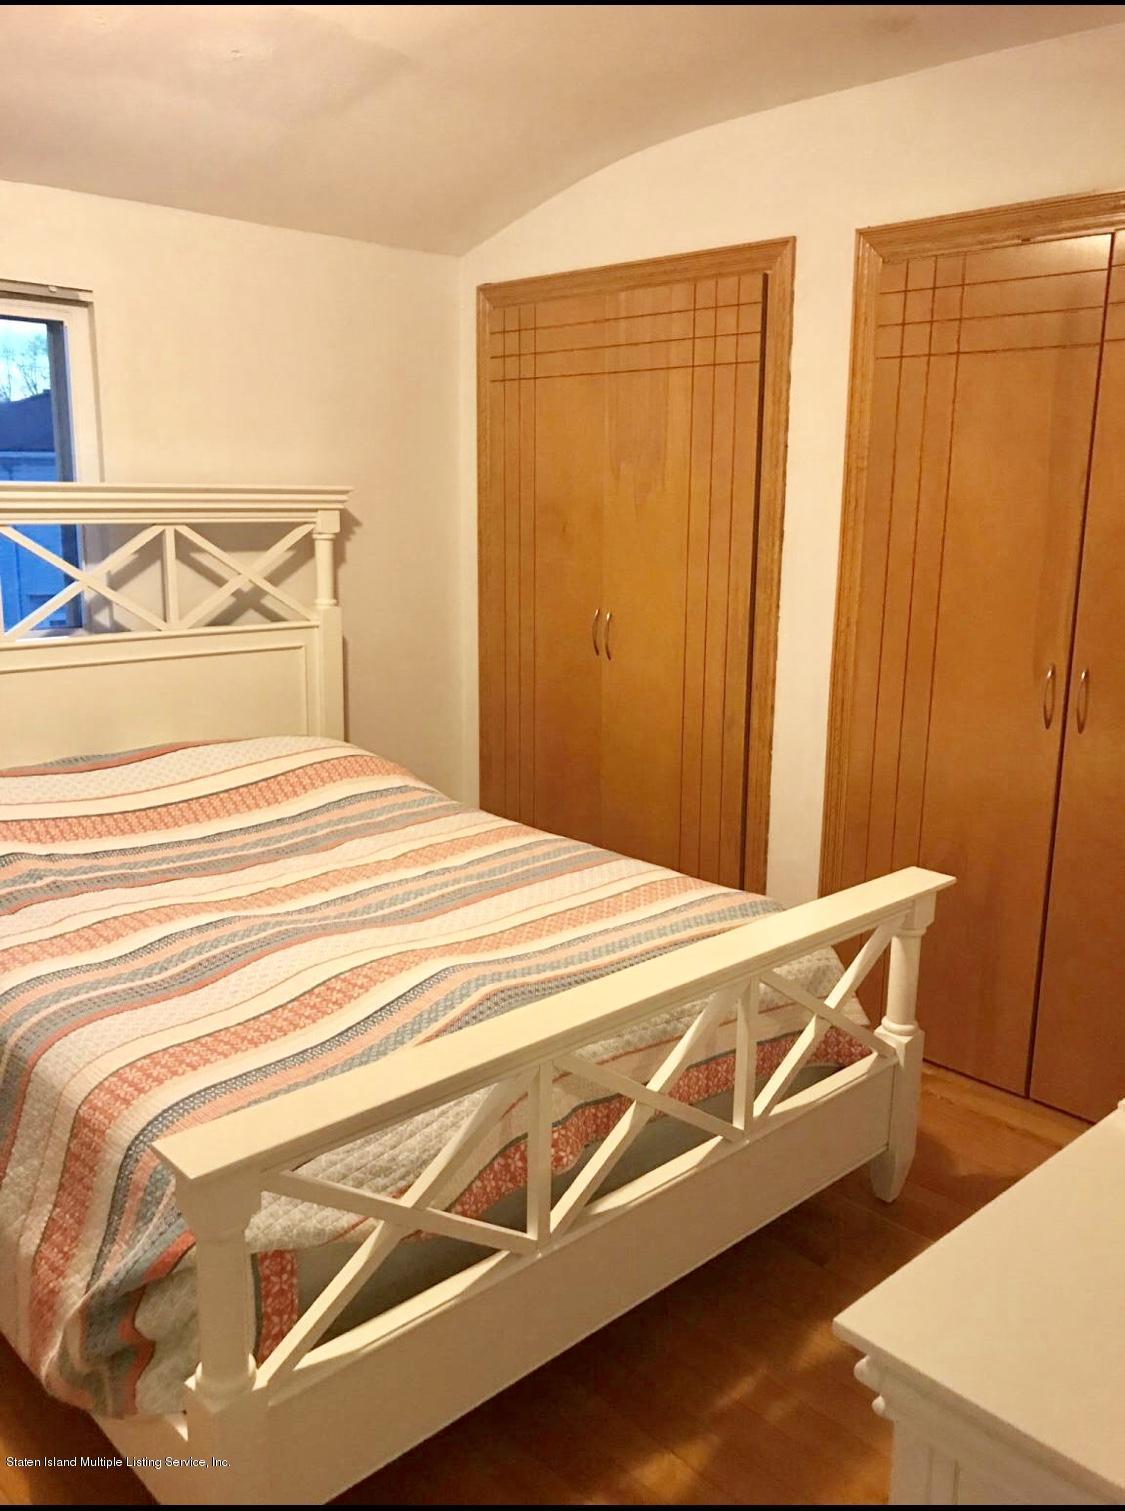 122 Winfield Street,Staten Island,New York,10305,United States,3 Bedrooms Bedrooms,6 Rooms Rooms,2 BathroomsBathrooms,Residential,Winfield,1128965